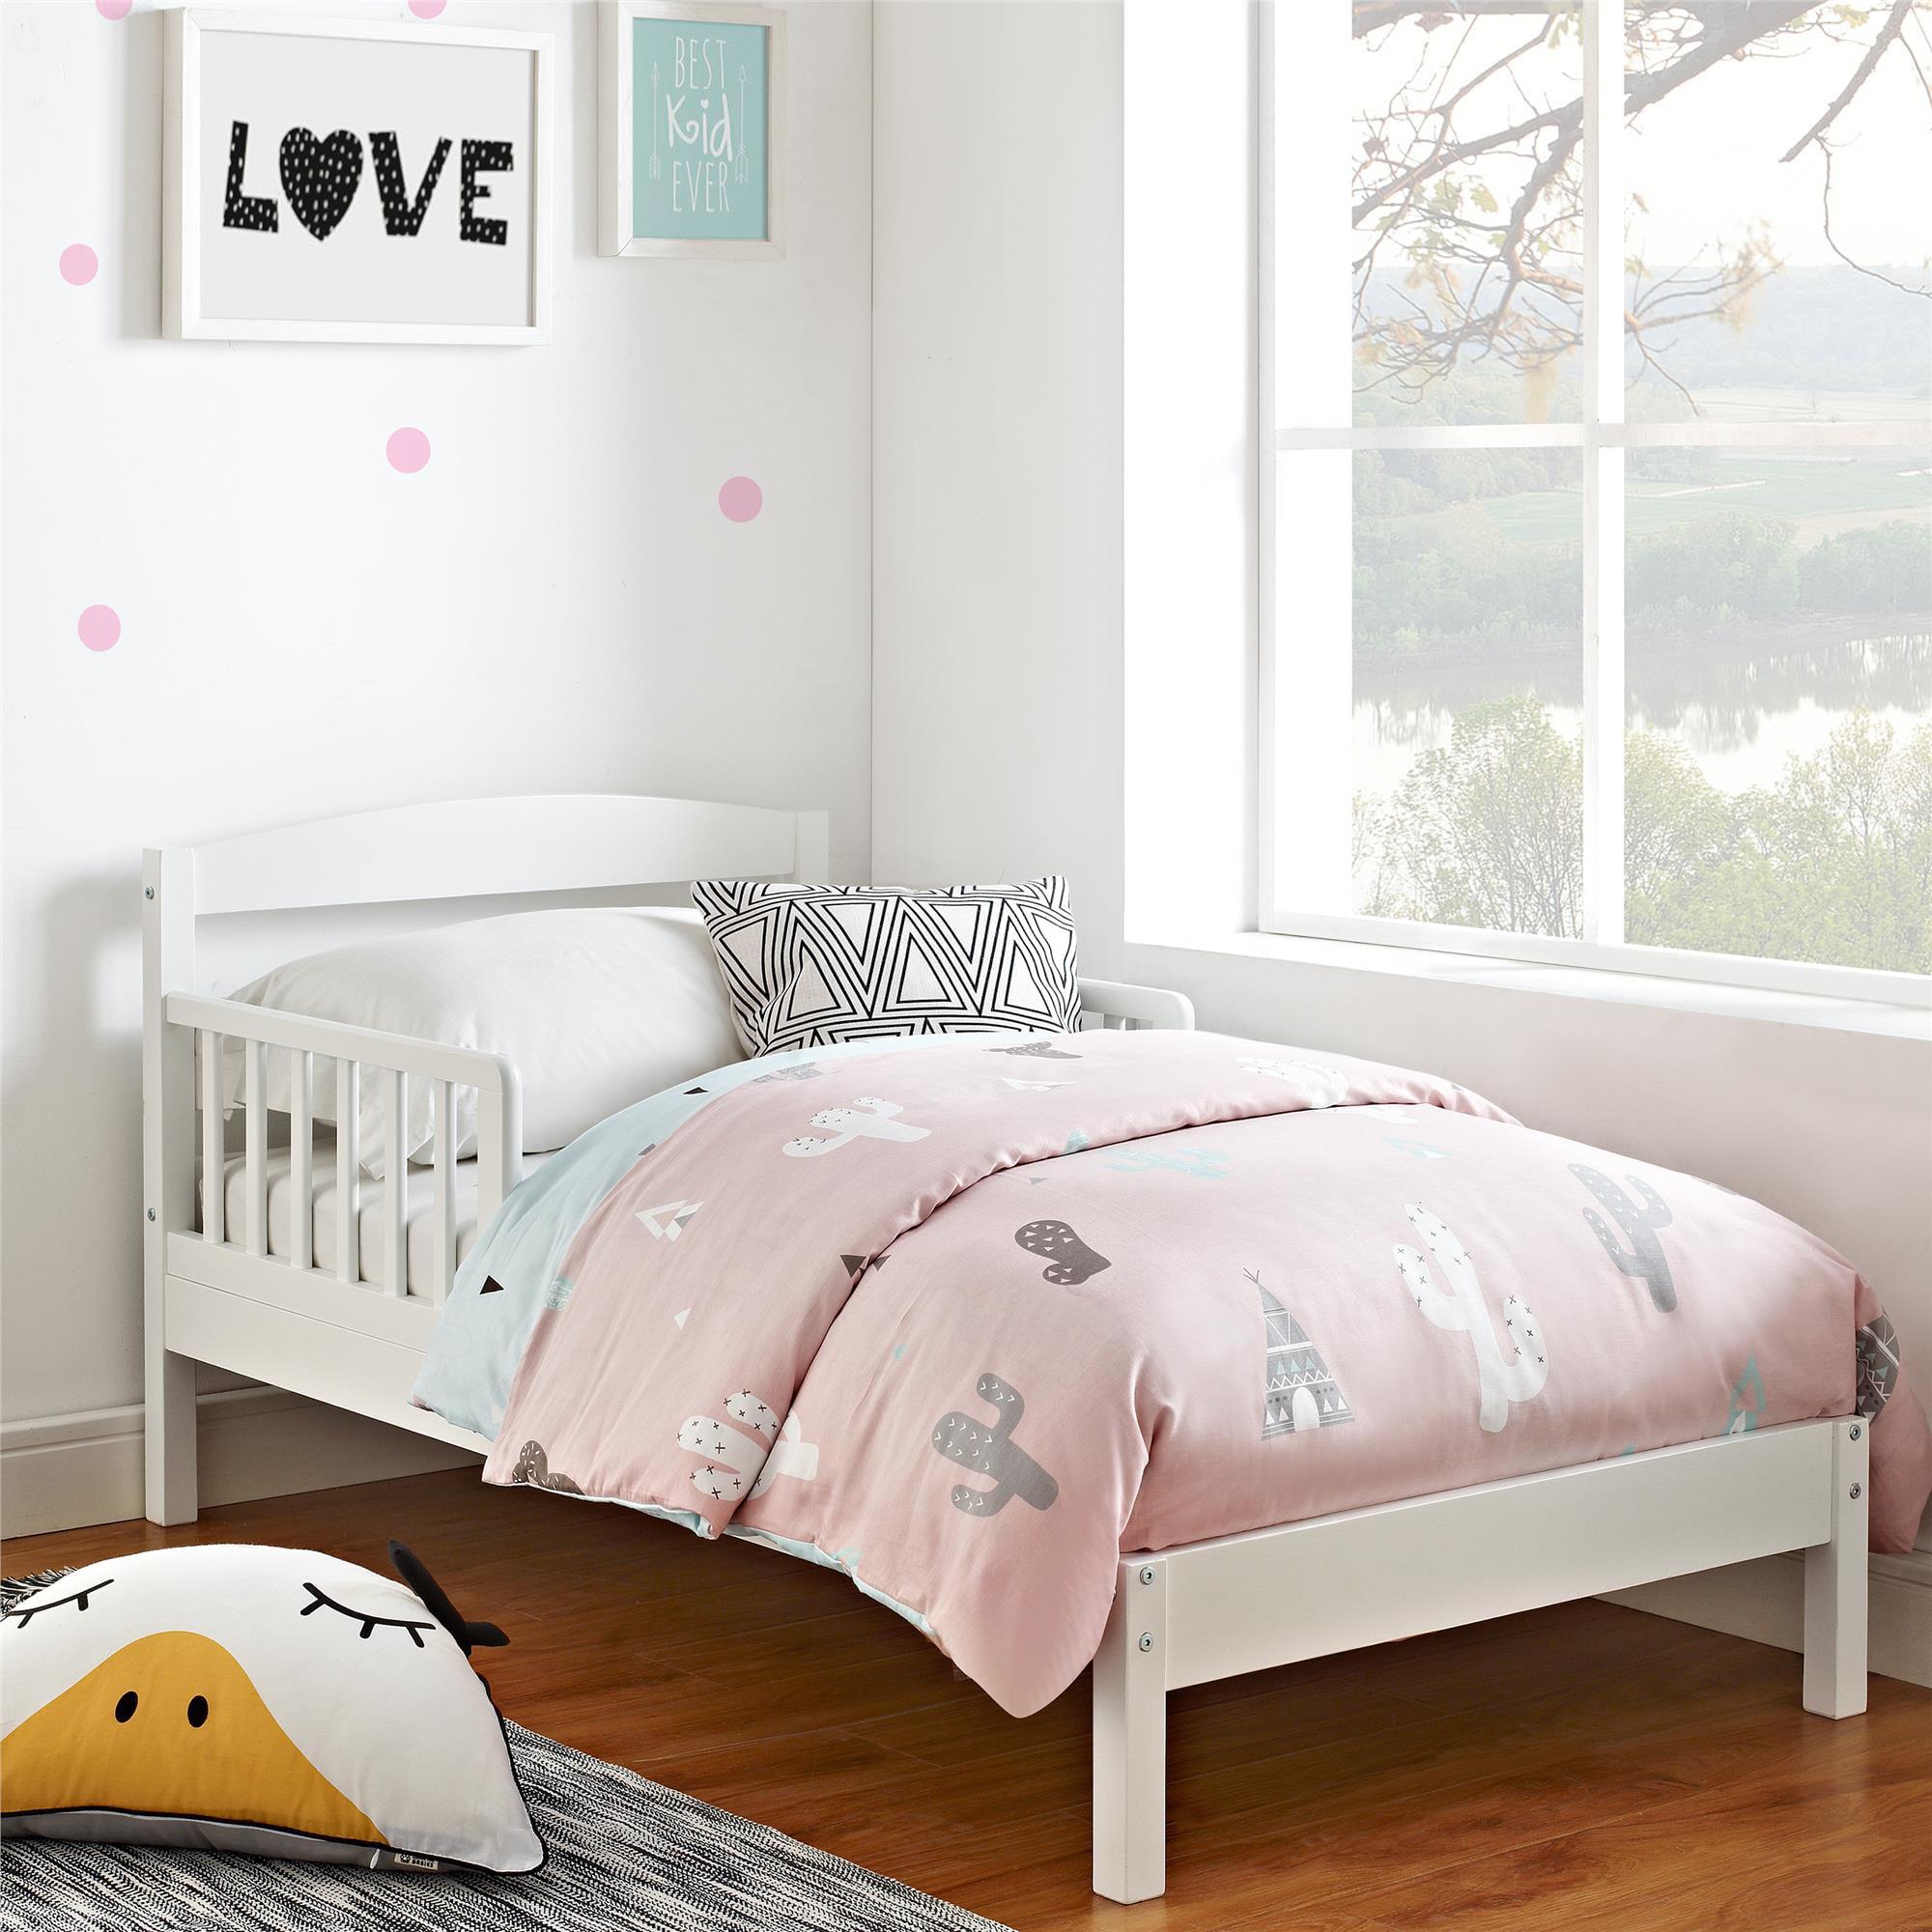 Baby Relax Jackson Toddler Bed, Kids Bedroom Furniture, White Wood -  Walmart.com